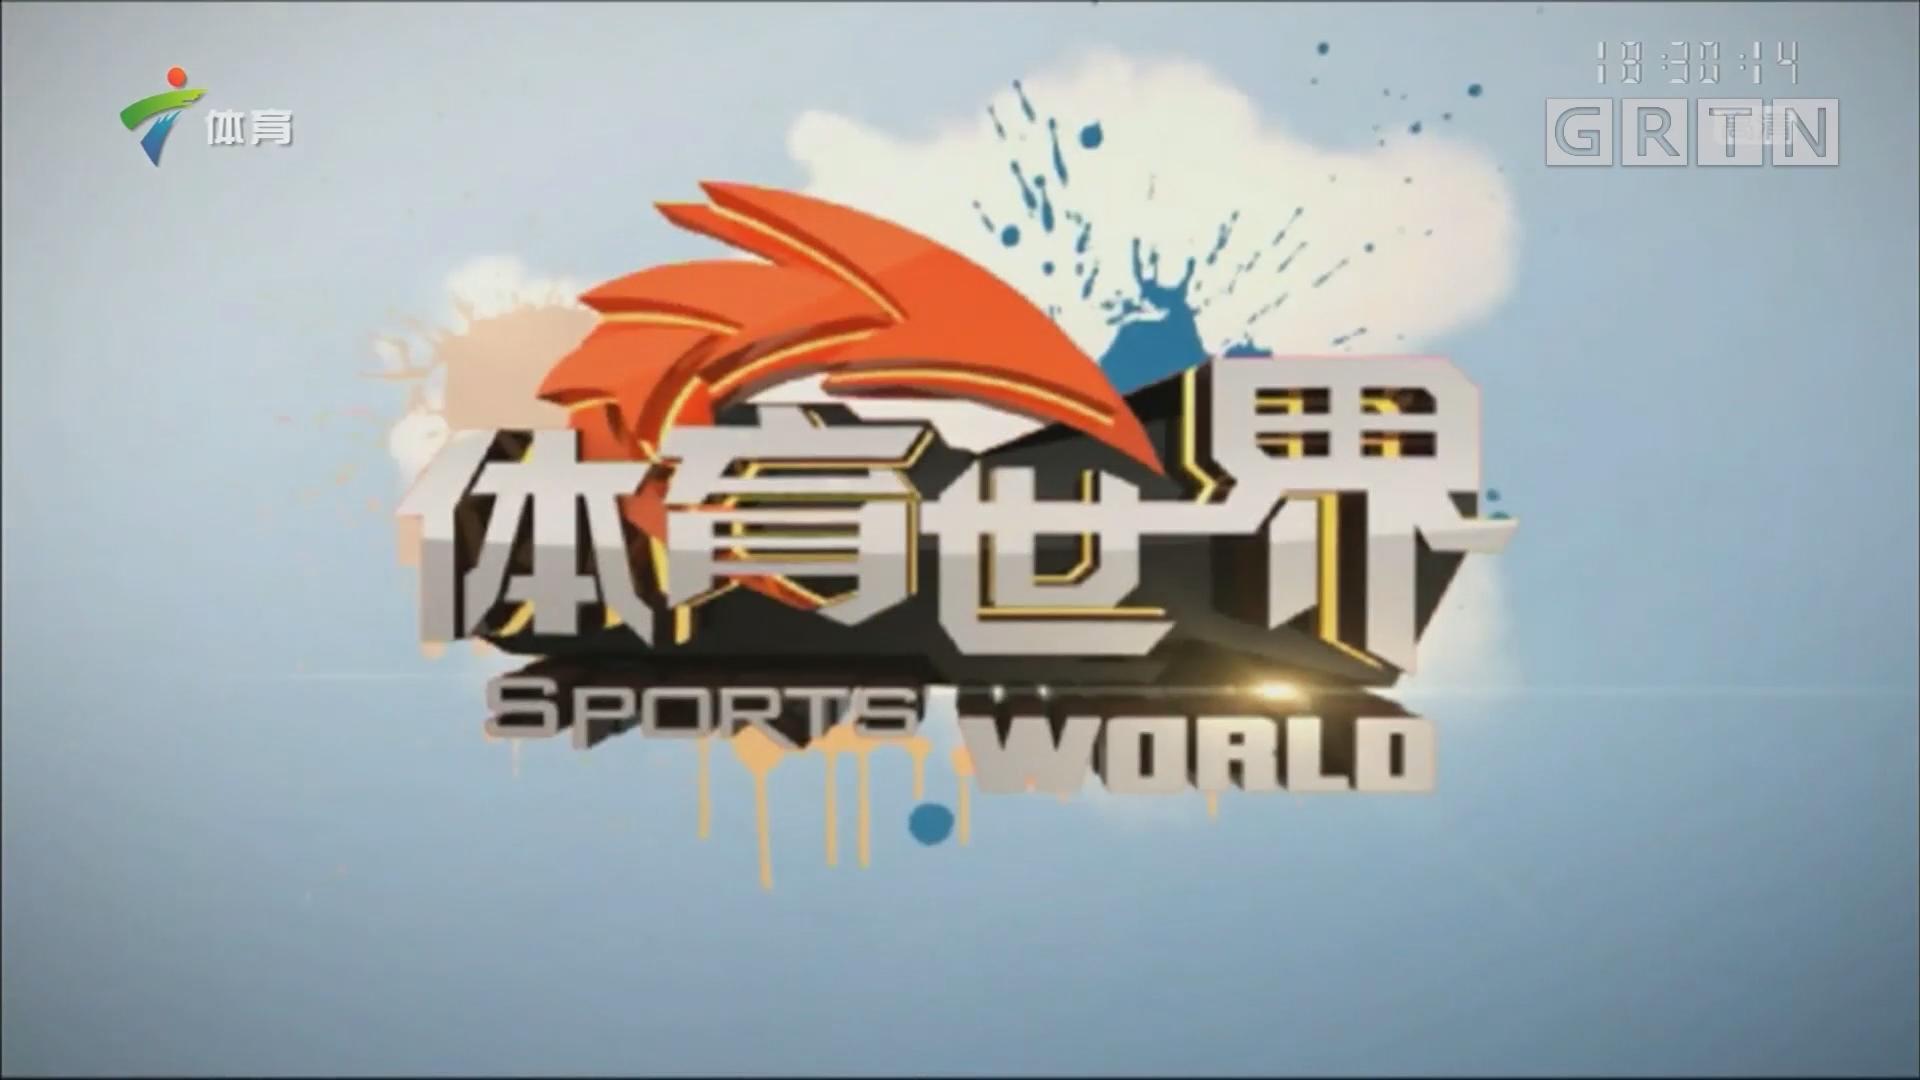 [HD][2018-01-08]体育世界:平昌冬奥火炬在韩国光州进行传递